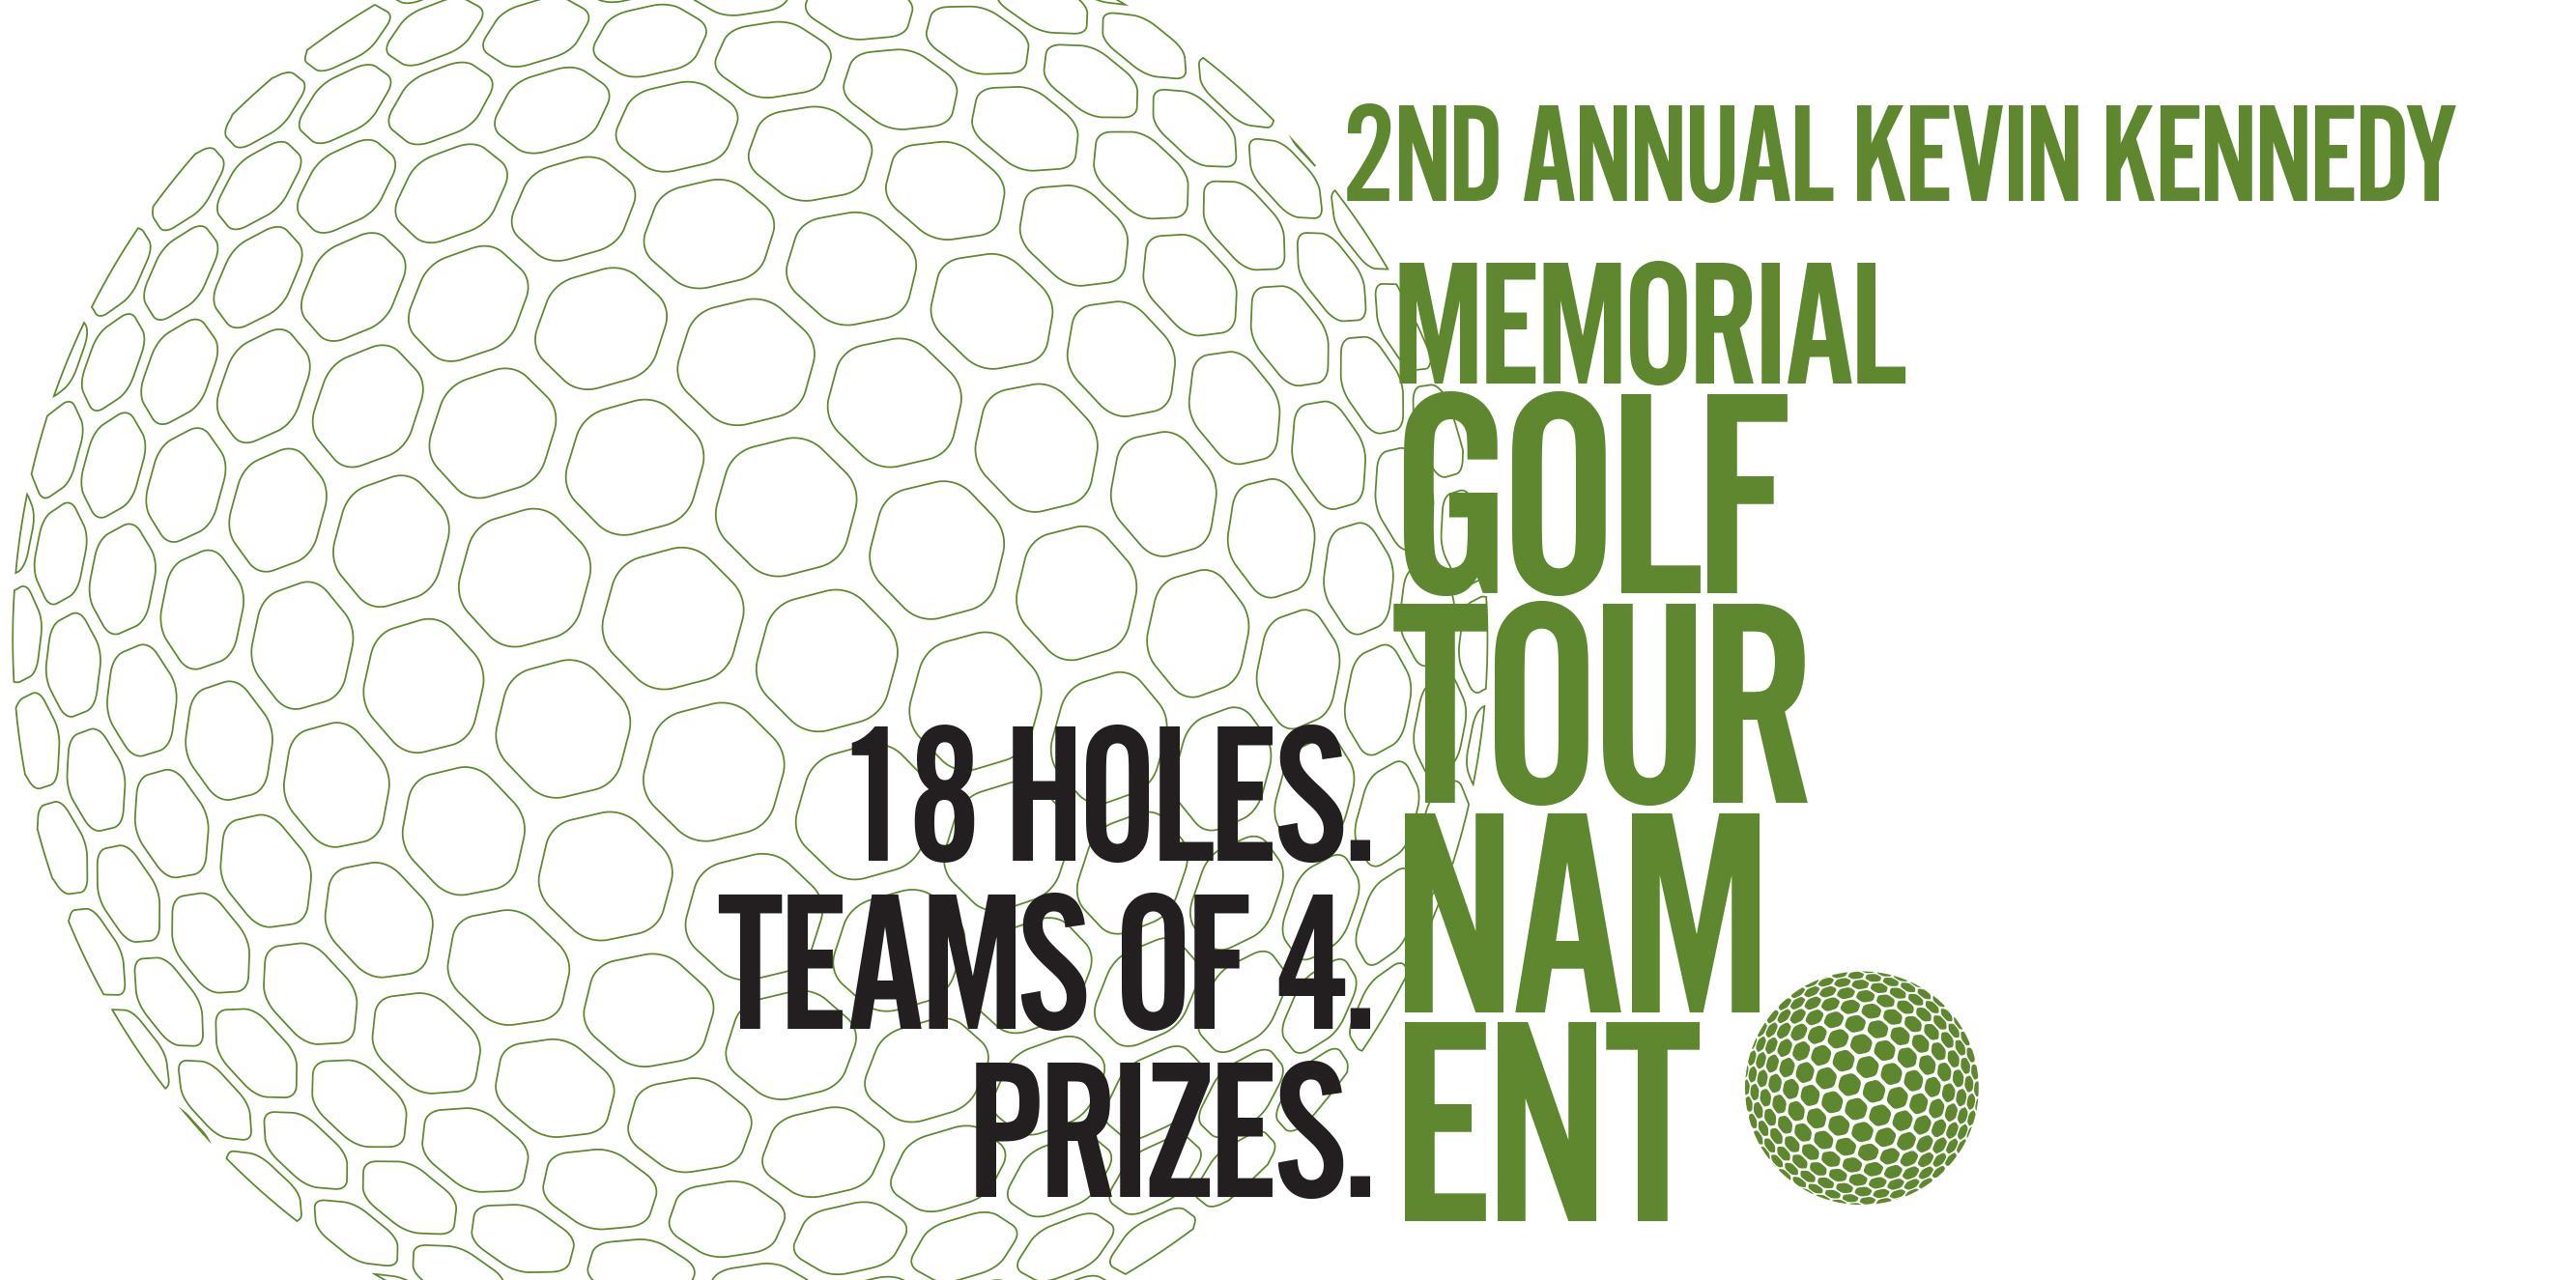 Brix Tavern Sponsored 2nd Annual Kevin Kennedy Memorial Golf Tournament